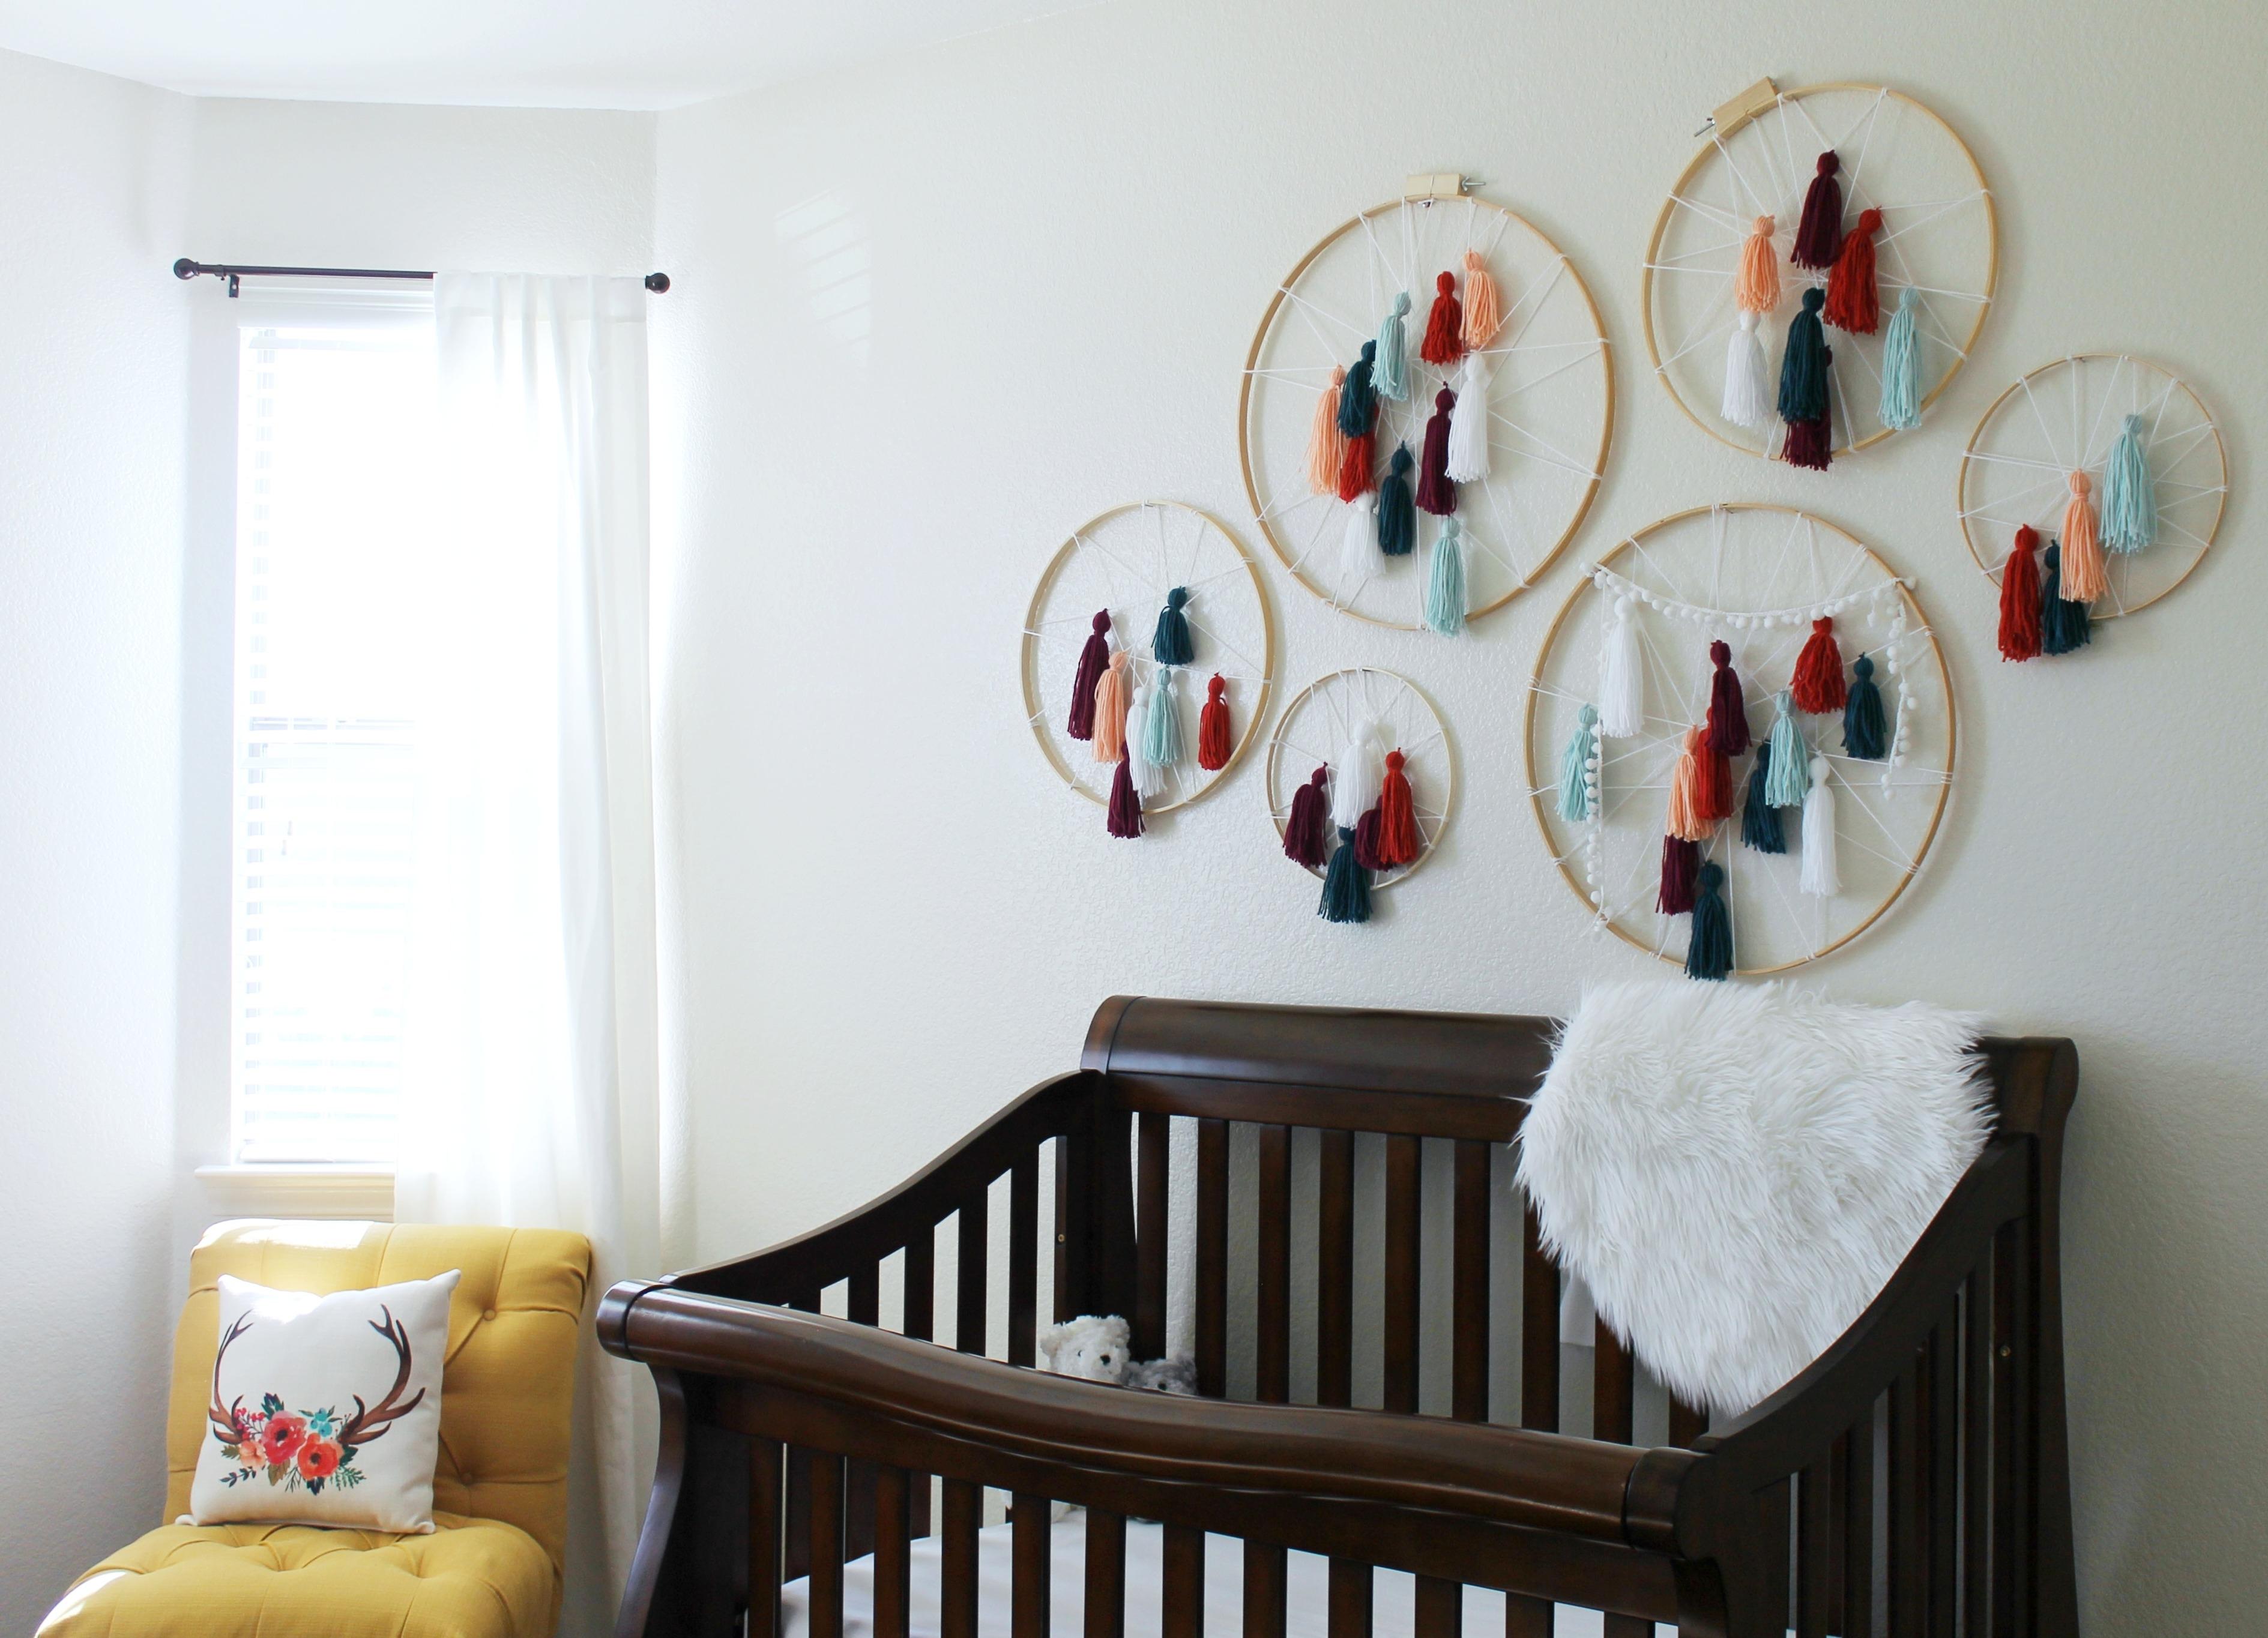 Diy Tassel Dreamcatcher Yarn Wall Art Tutorial – Child At Heart Blog Regarding Yarn Wall Art (View 20 of 20)